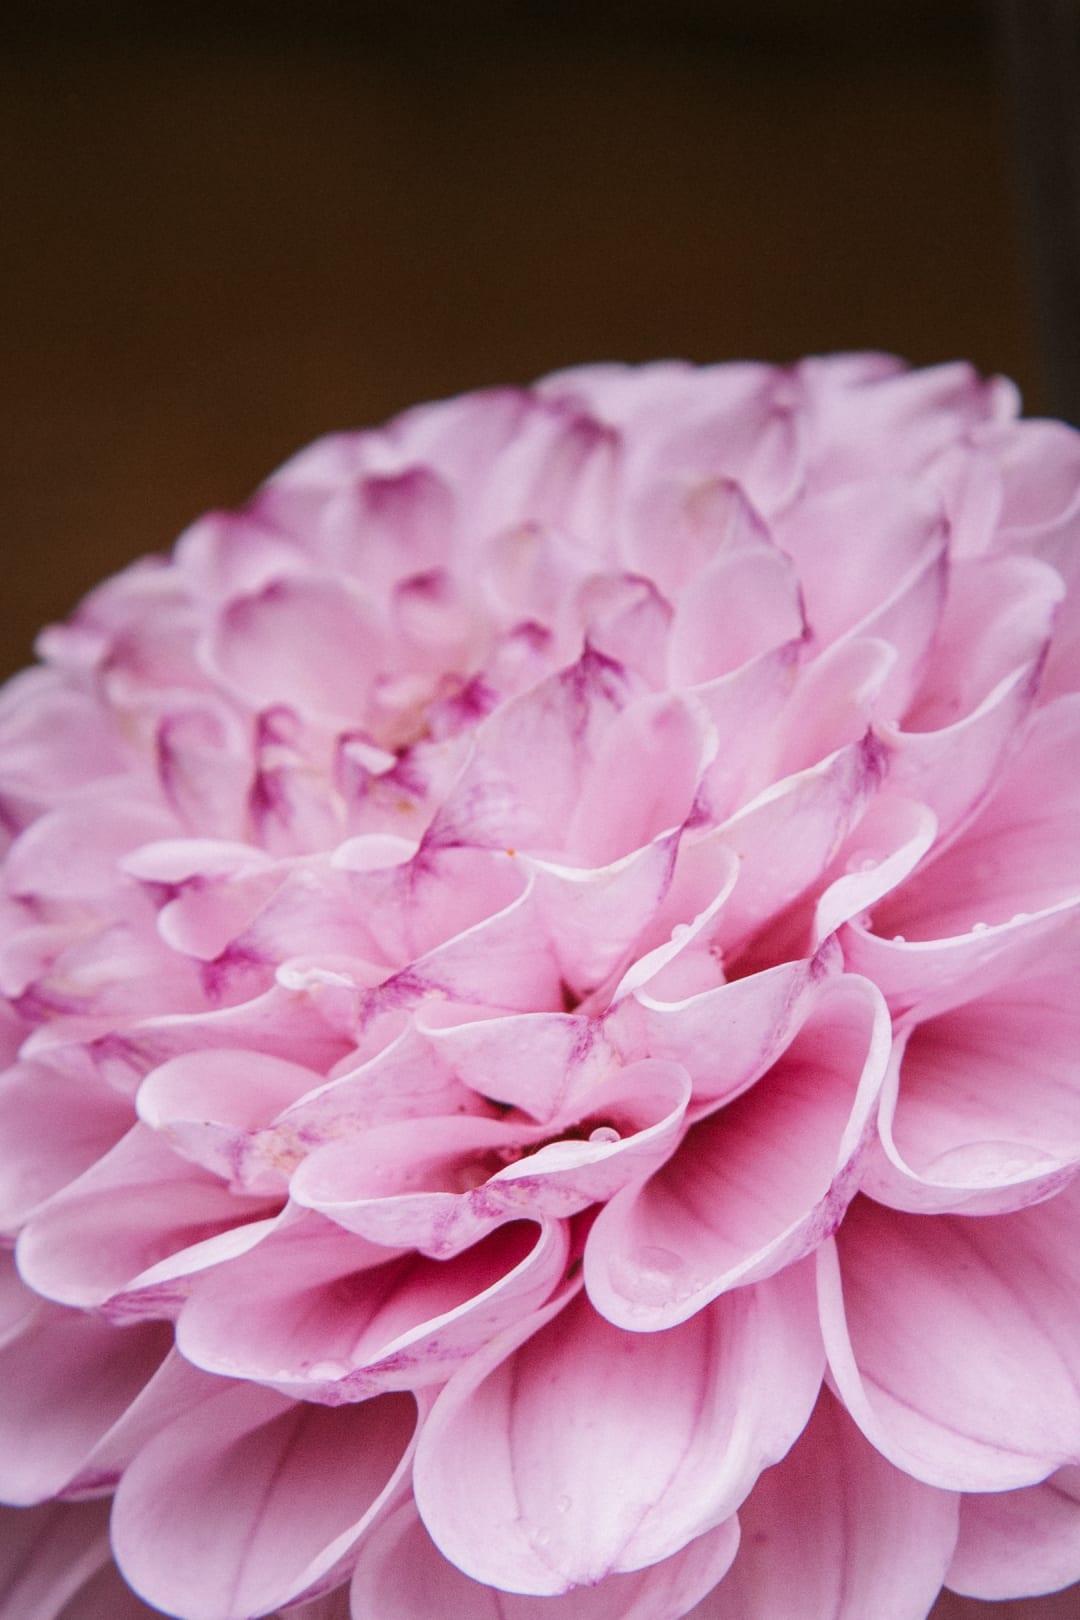 Close up of a pastel pink ball dahlia flower.